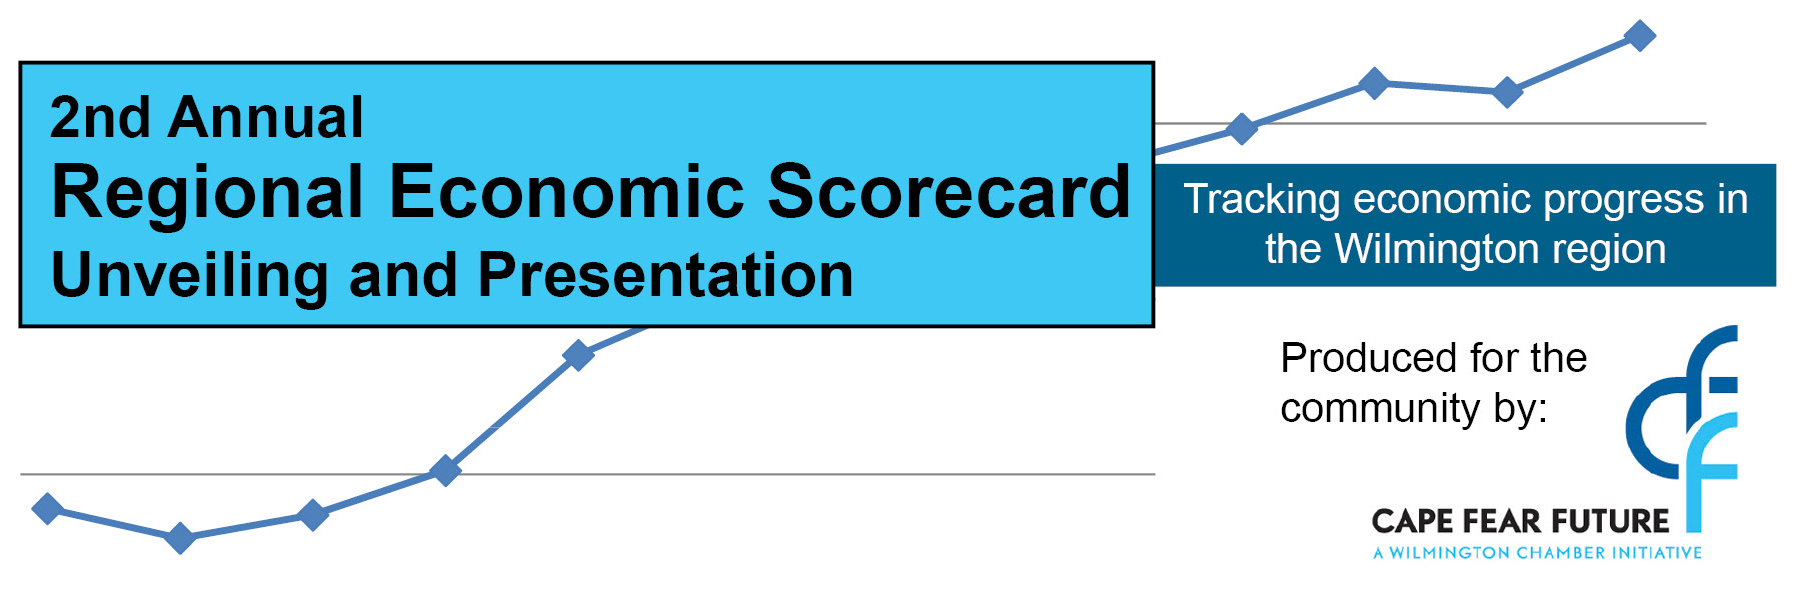 Cvent Scorecard 2016